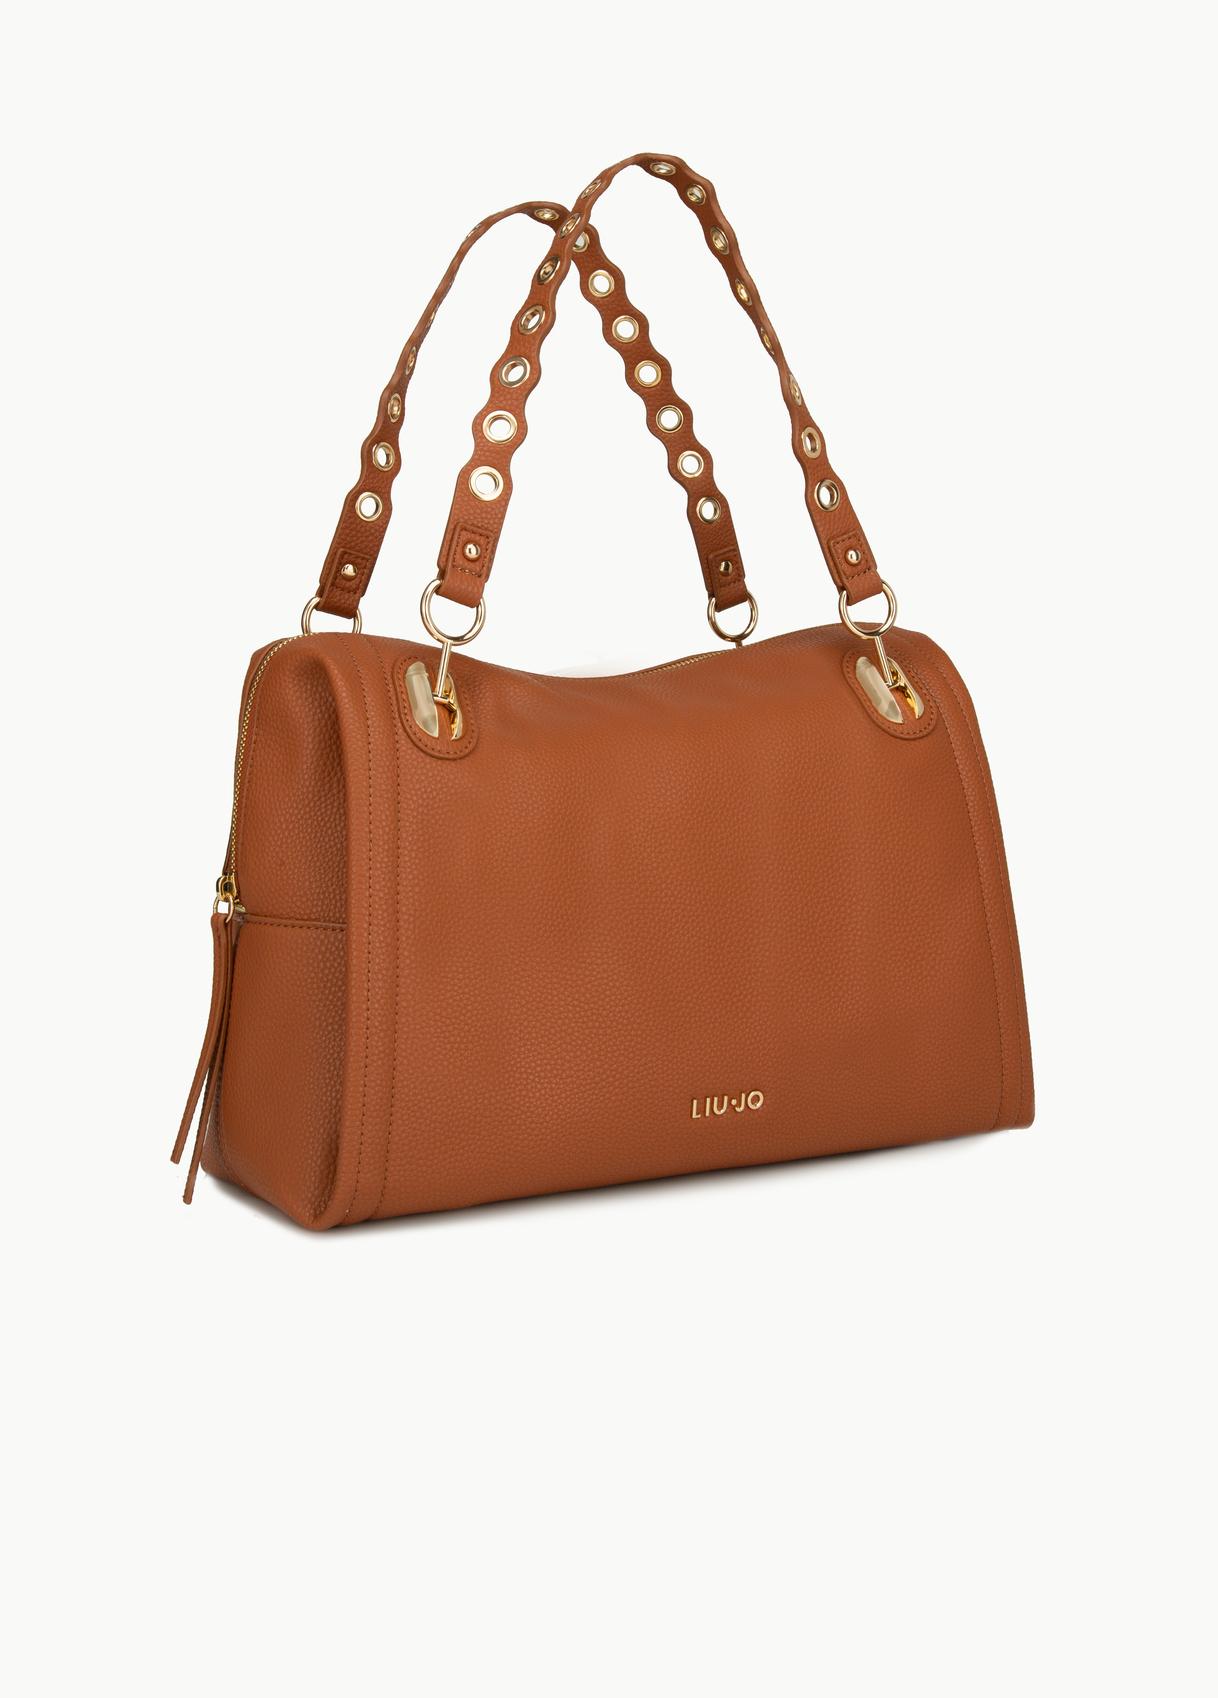 8056156378274-Bags-Bowlingbags-N69044E003381154-S-AL-C-N-03-N